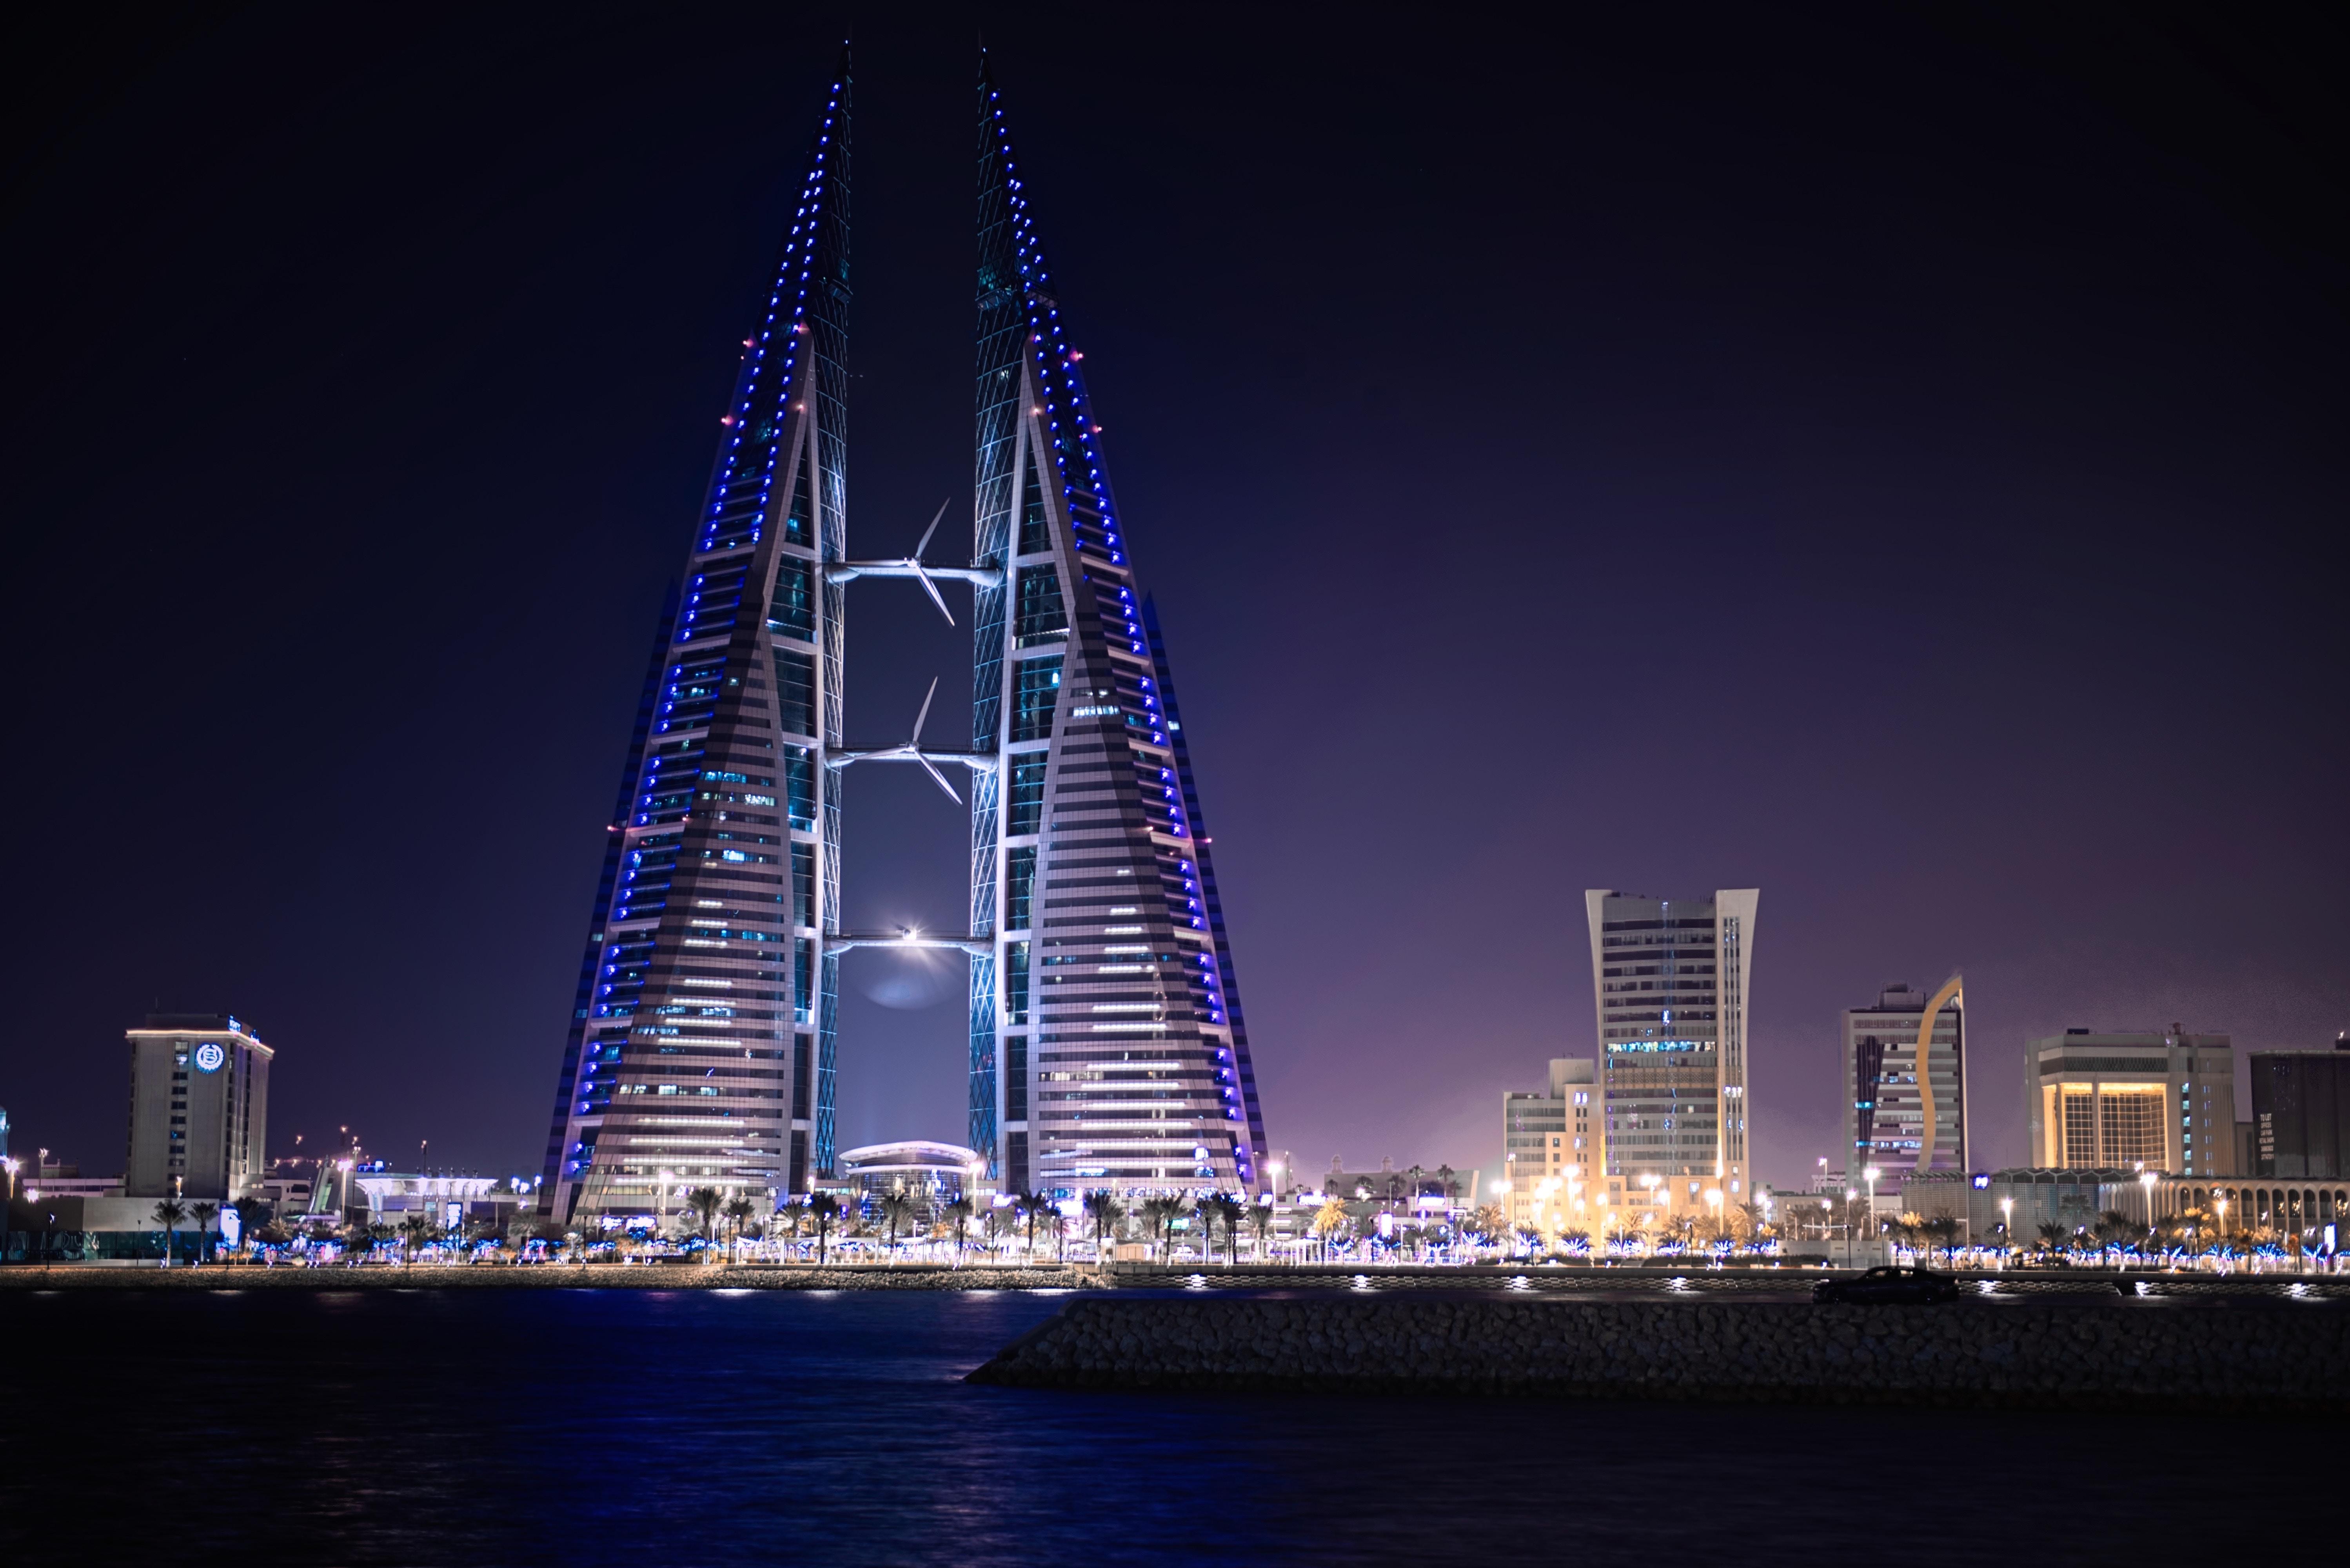 Saudi Arabia Riyadh airport shuttle transfer